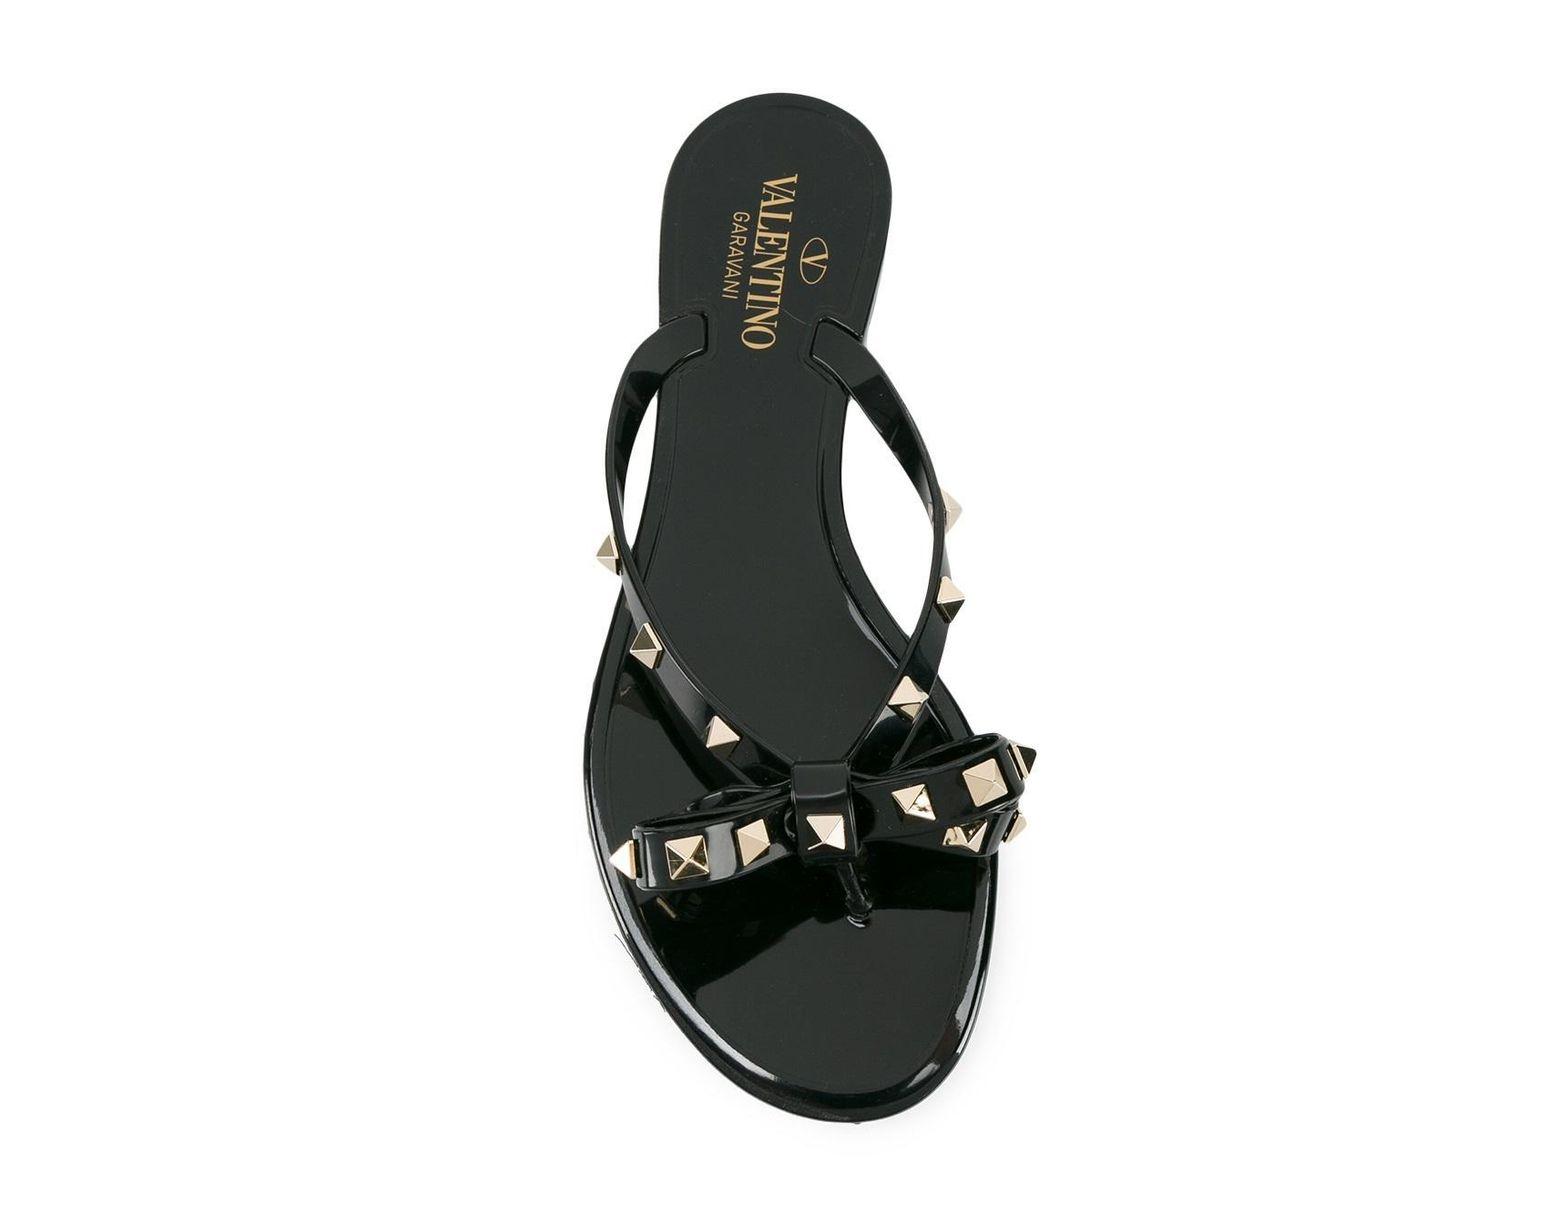 c487686288a5b Valentino Rockstud Thong Sandals in Orange - Save 61% - Lyst